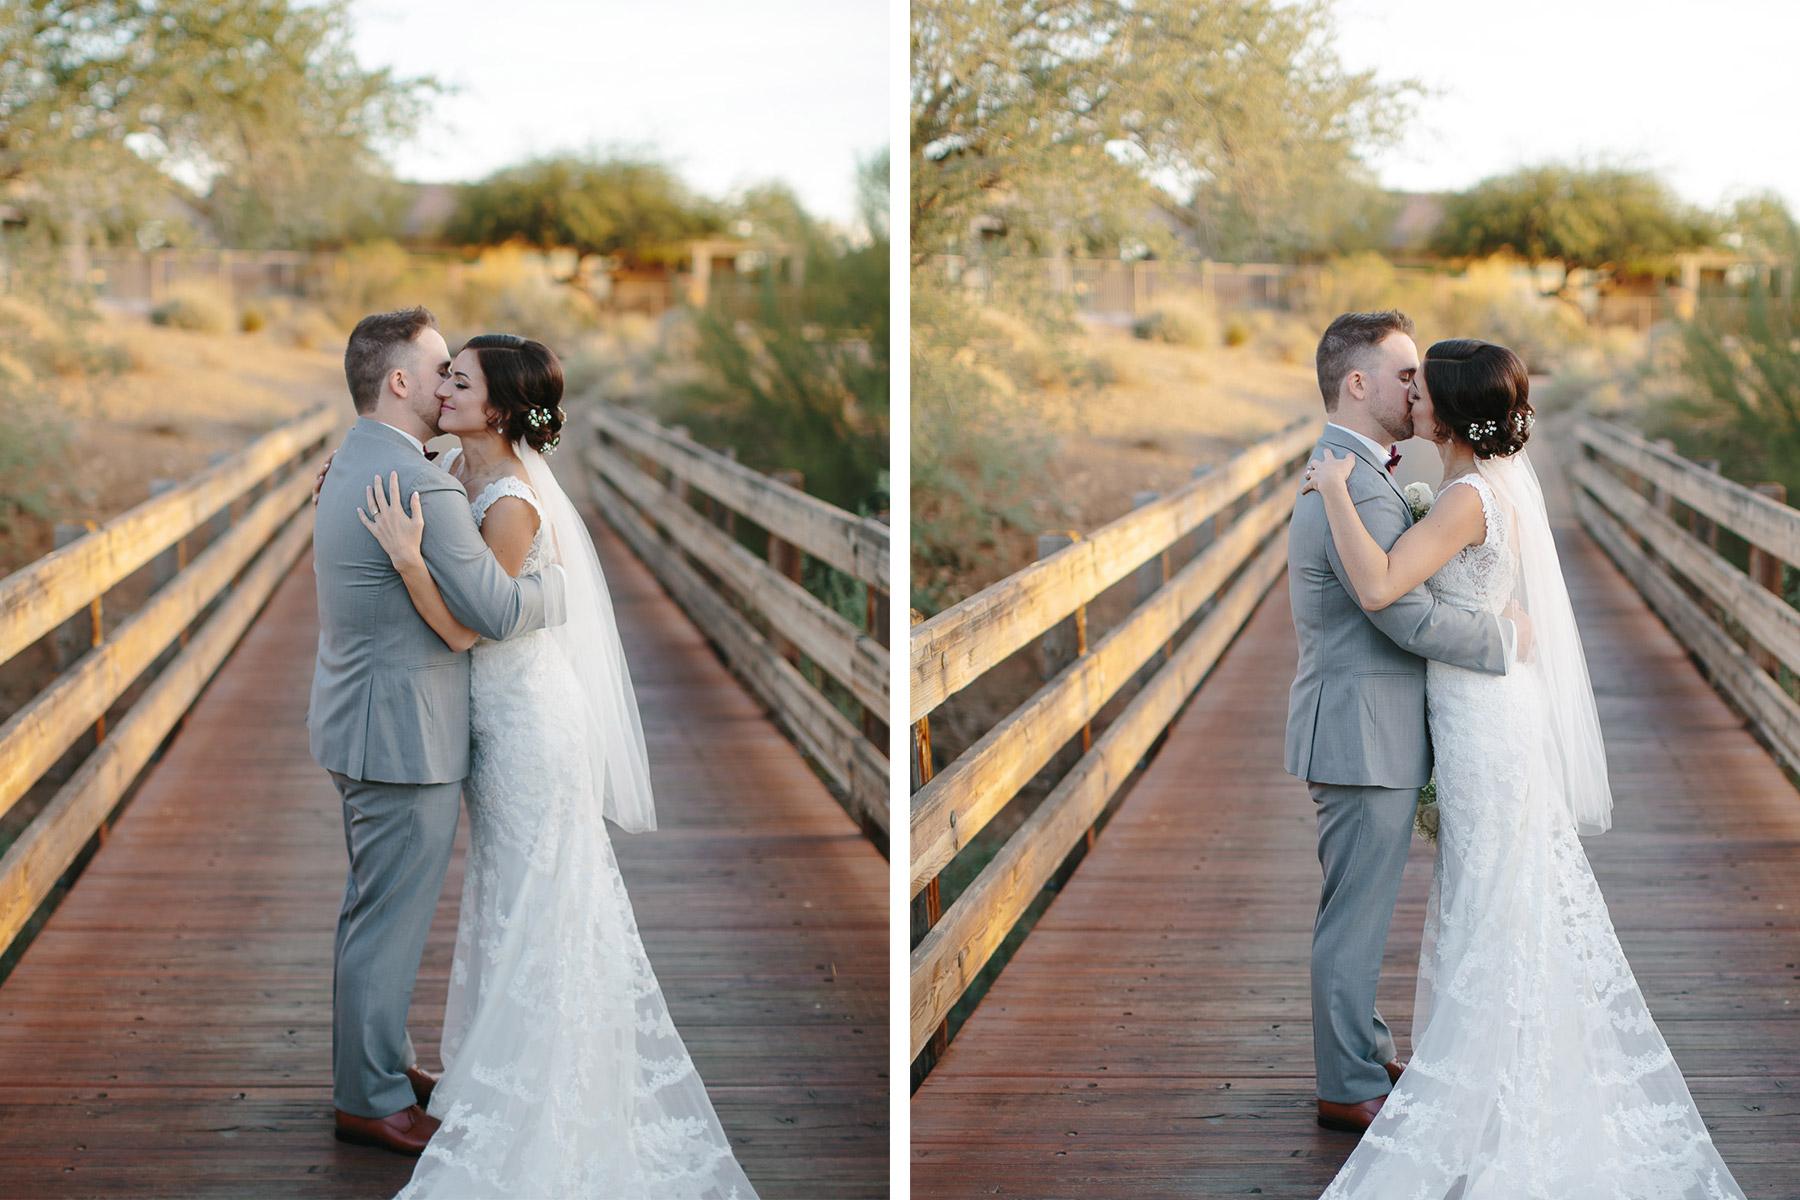 161210-Luxium-Weddings-Arizona-Matt-Jenny-Anthem-Golf-Country-Club-1050a.jpg